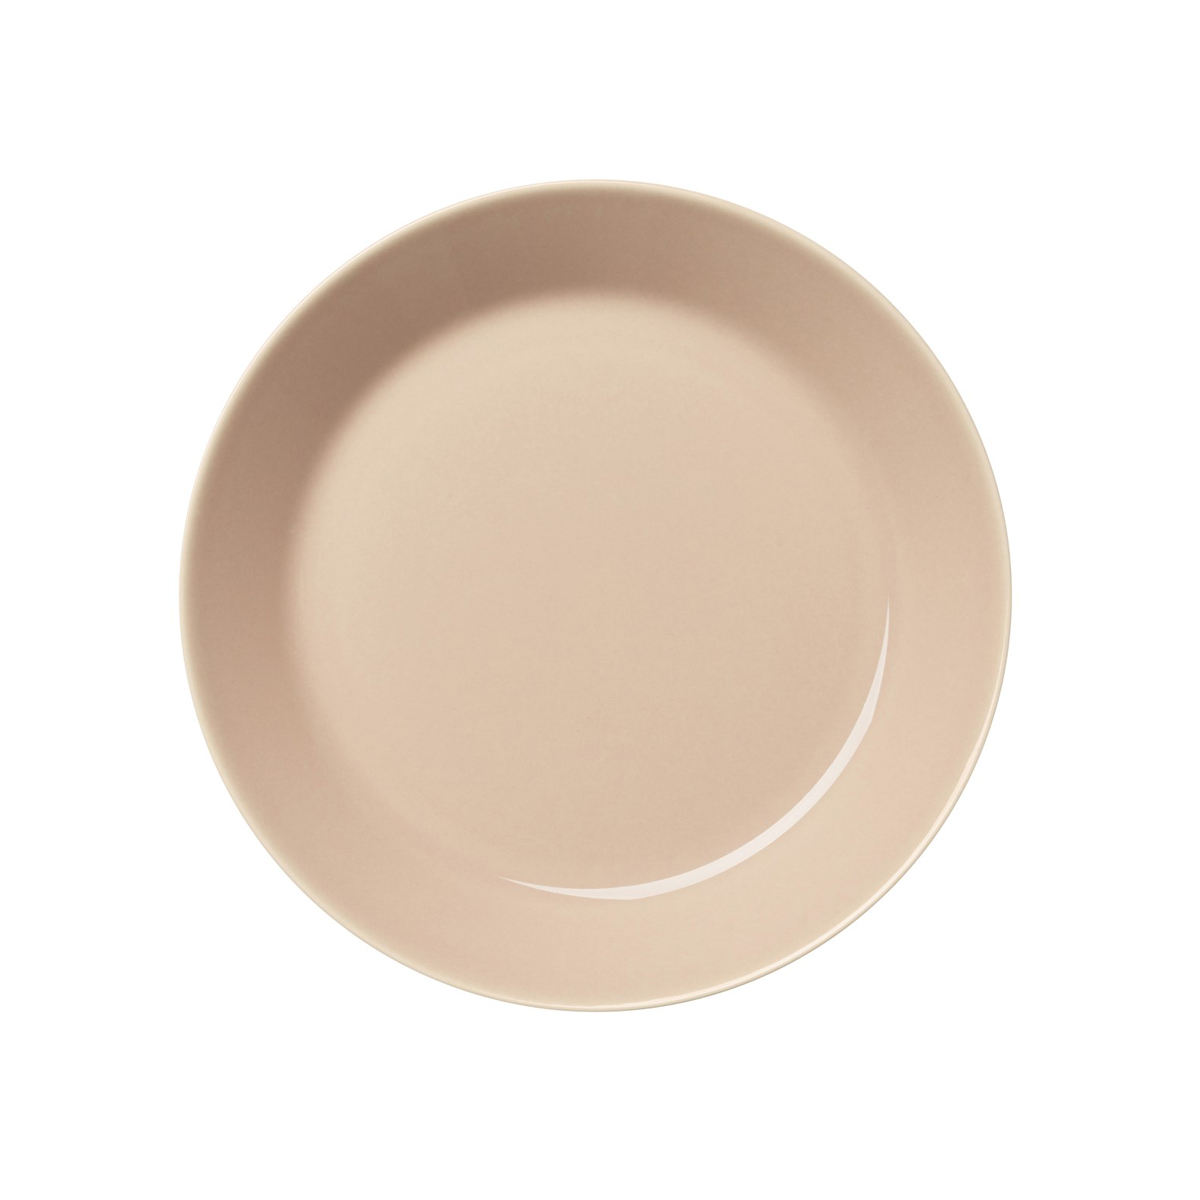 Teema_plate_17cm_powder